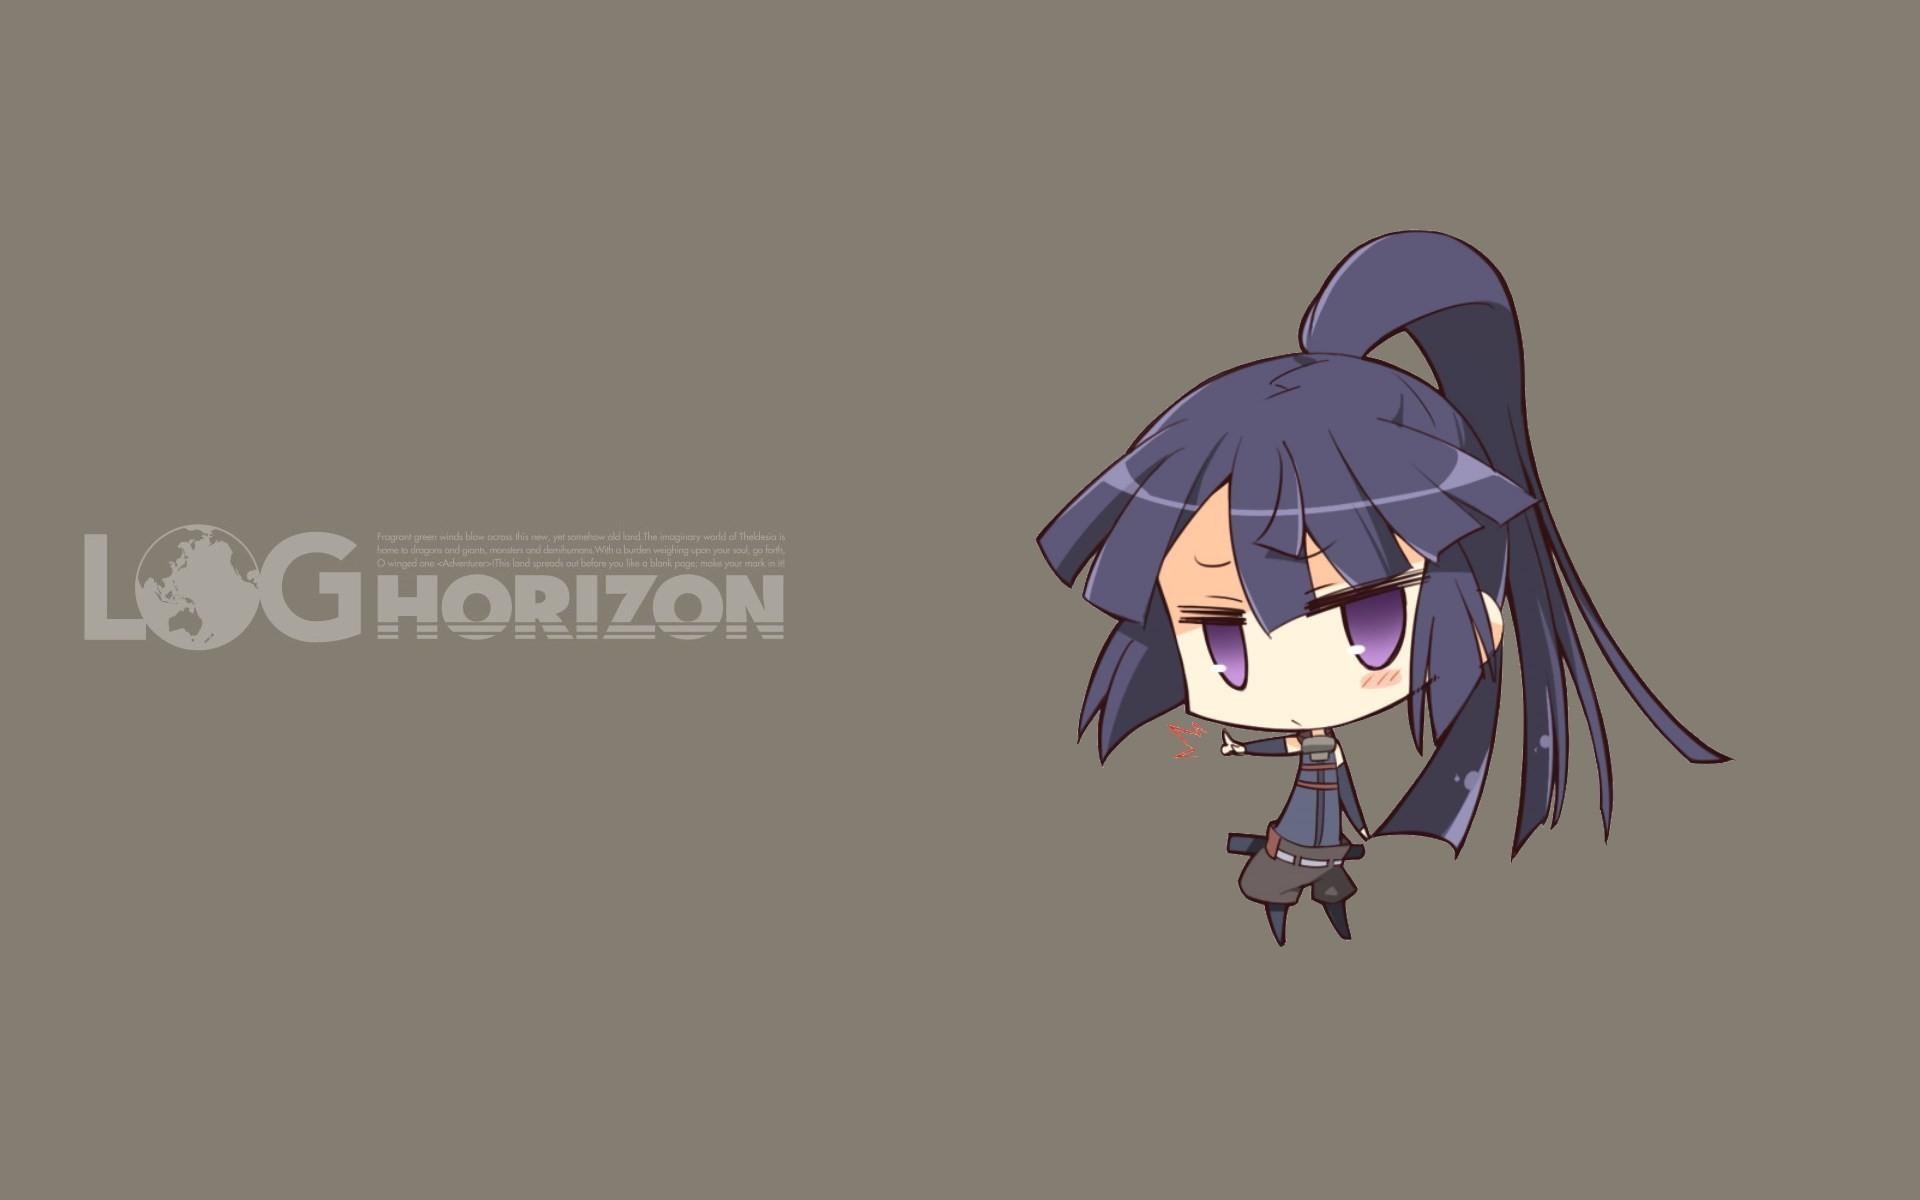 Anime Log Horizon series